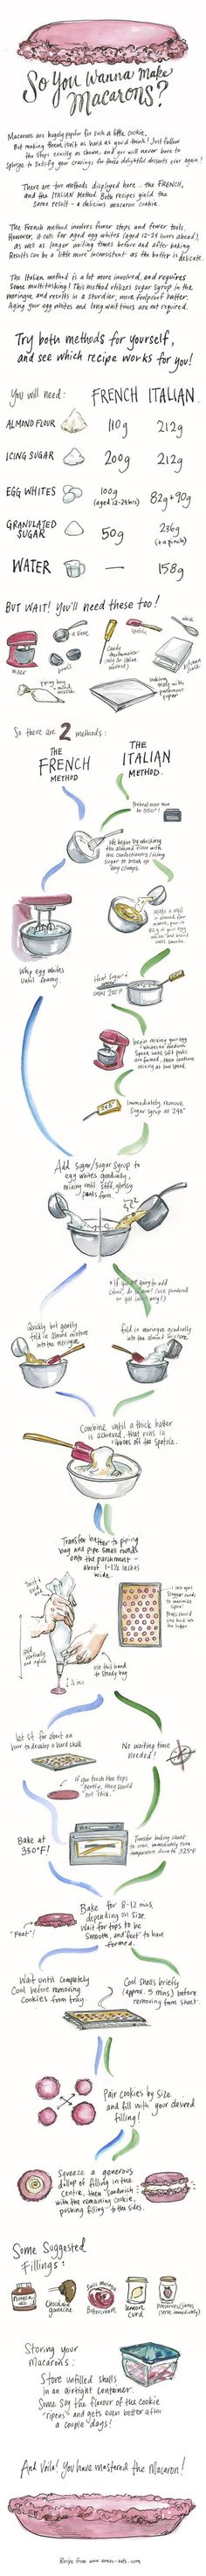 How to make macarons: